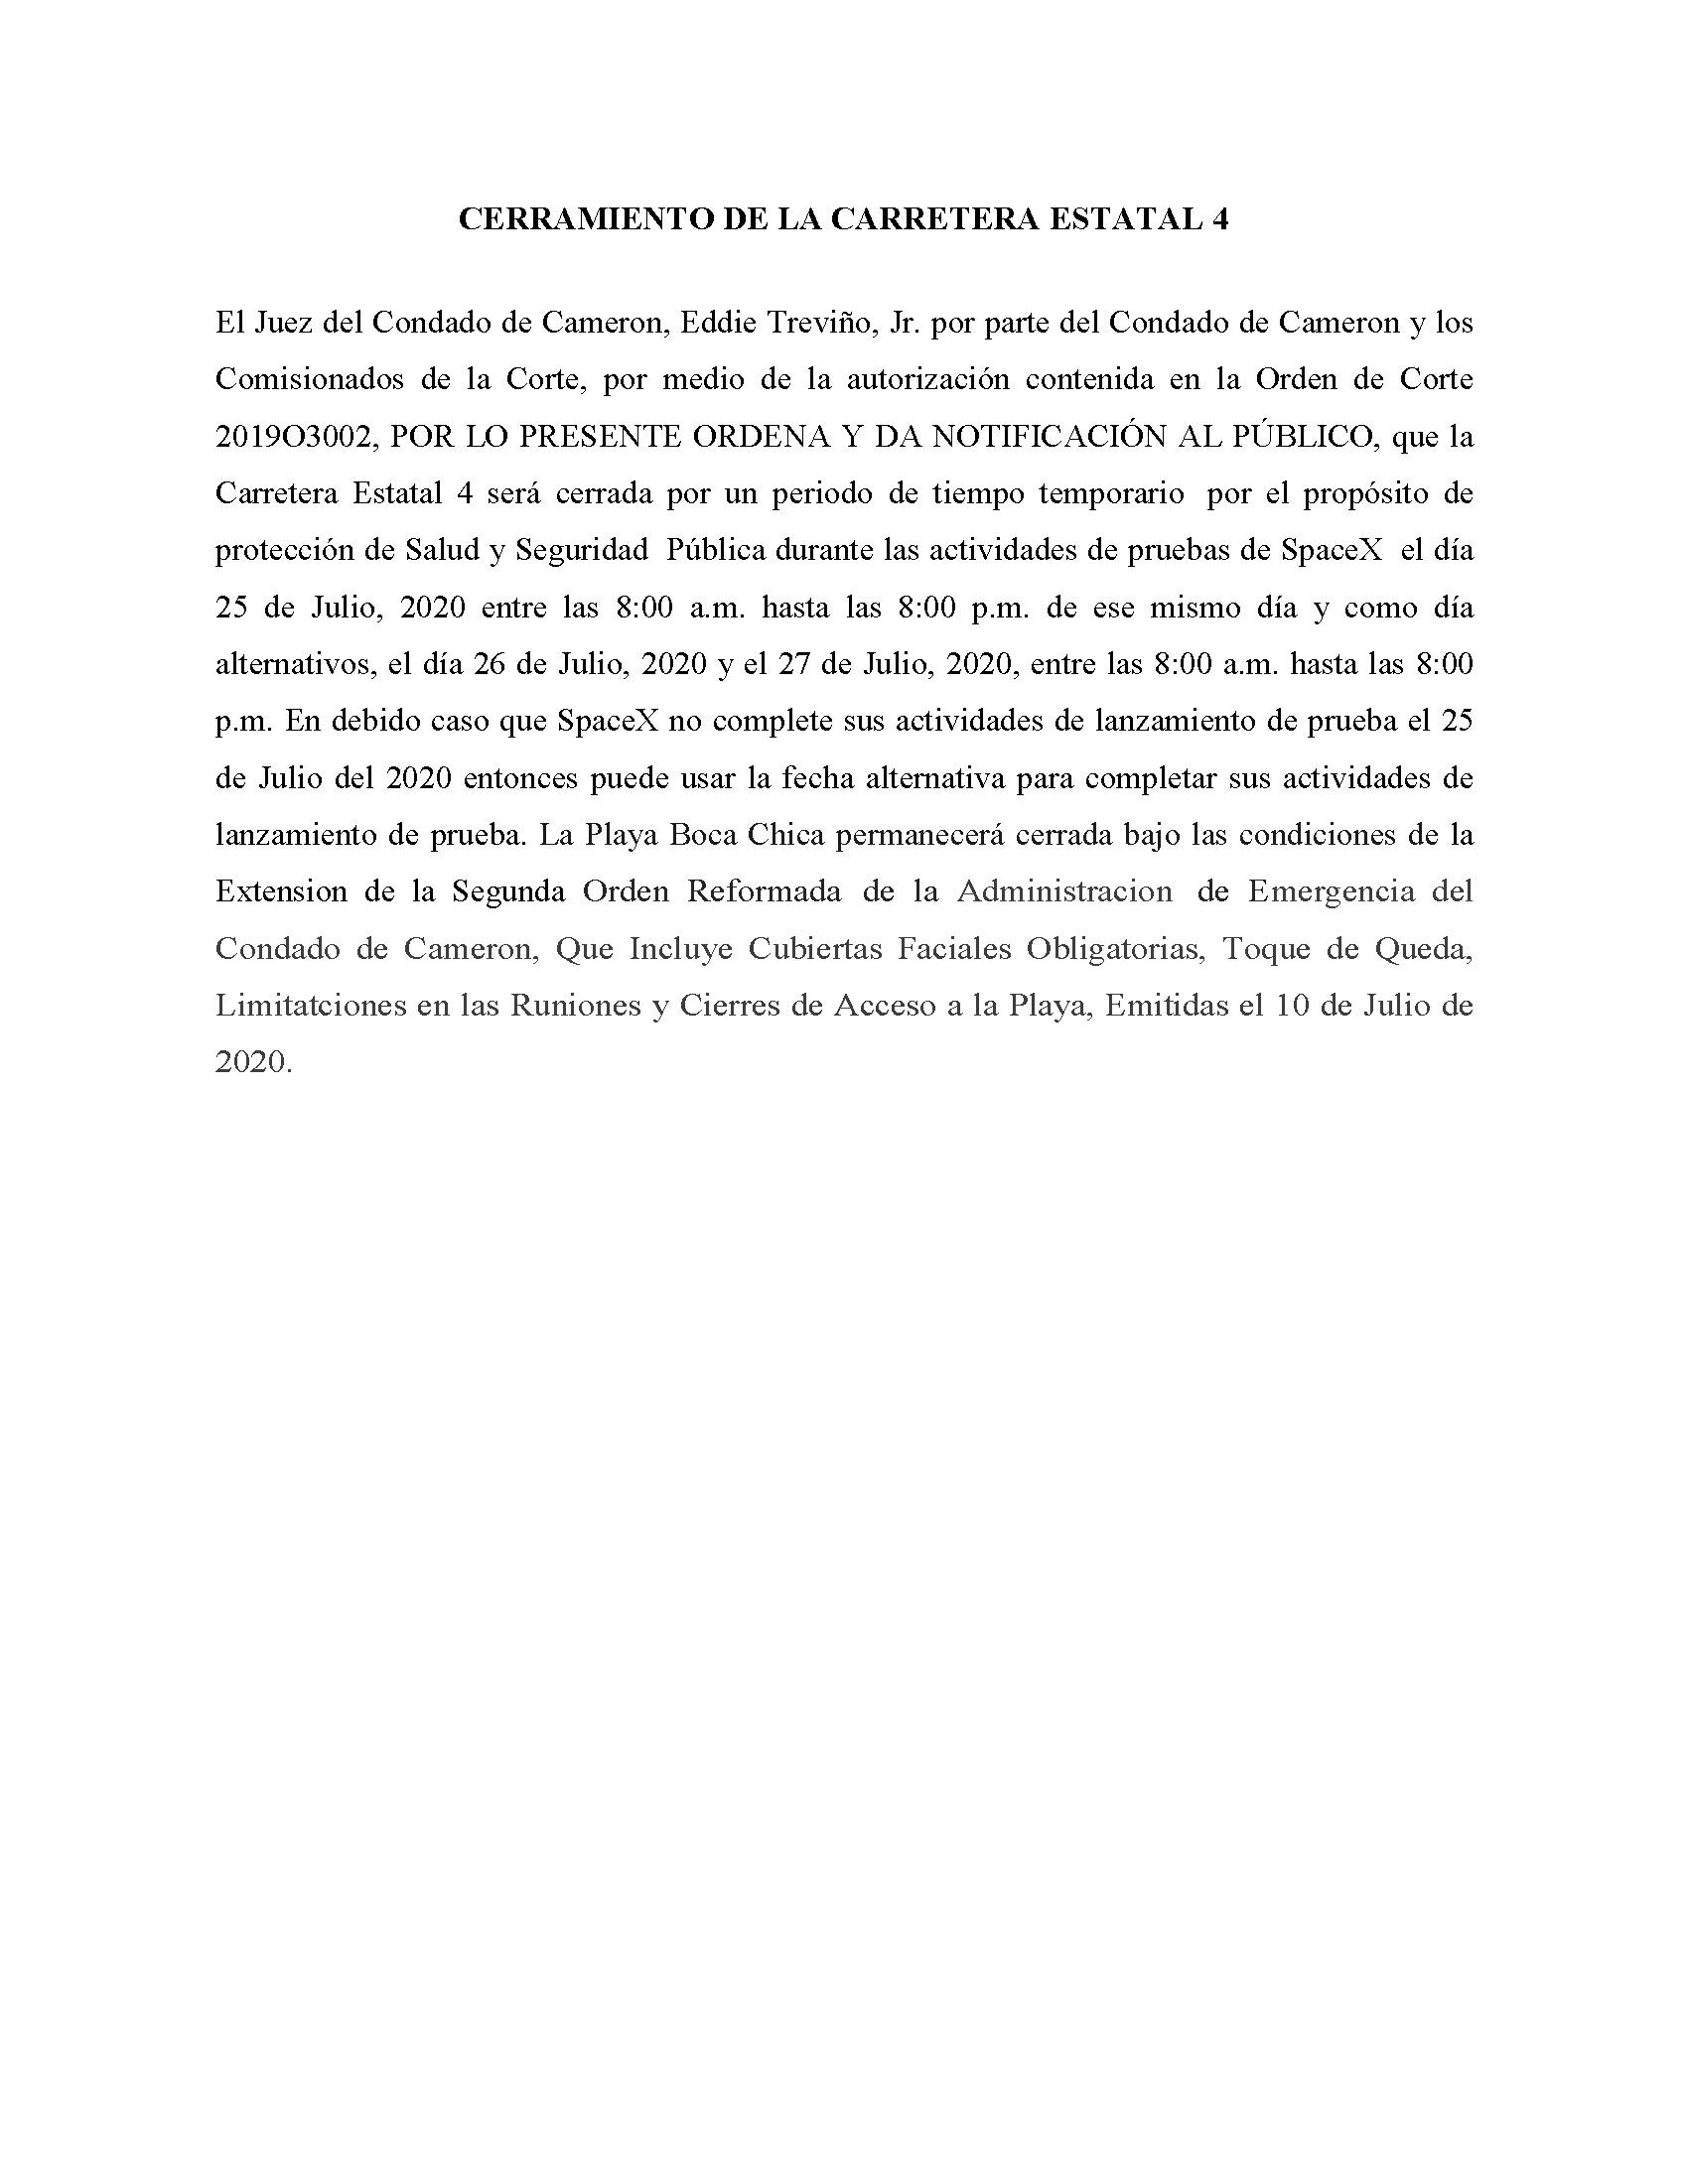 ORDER.CLOSURE OF HIGHWAY 4.SPANISH.07.25.20